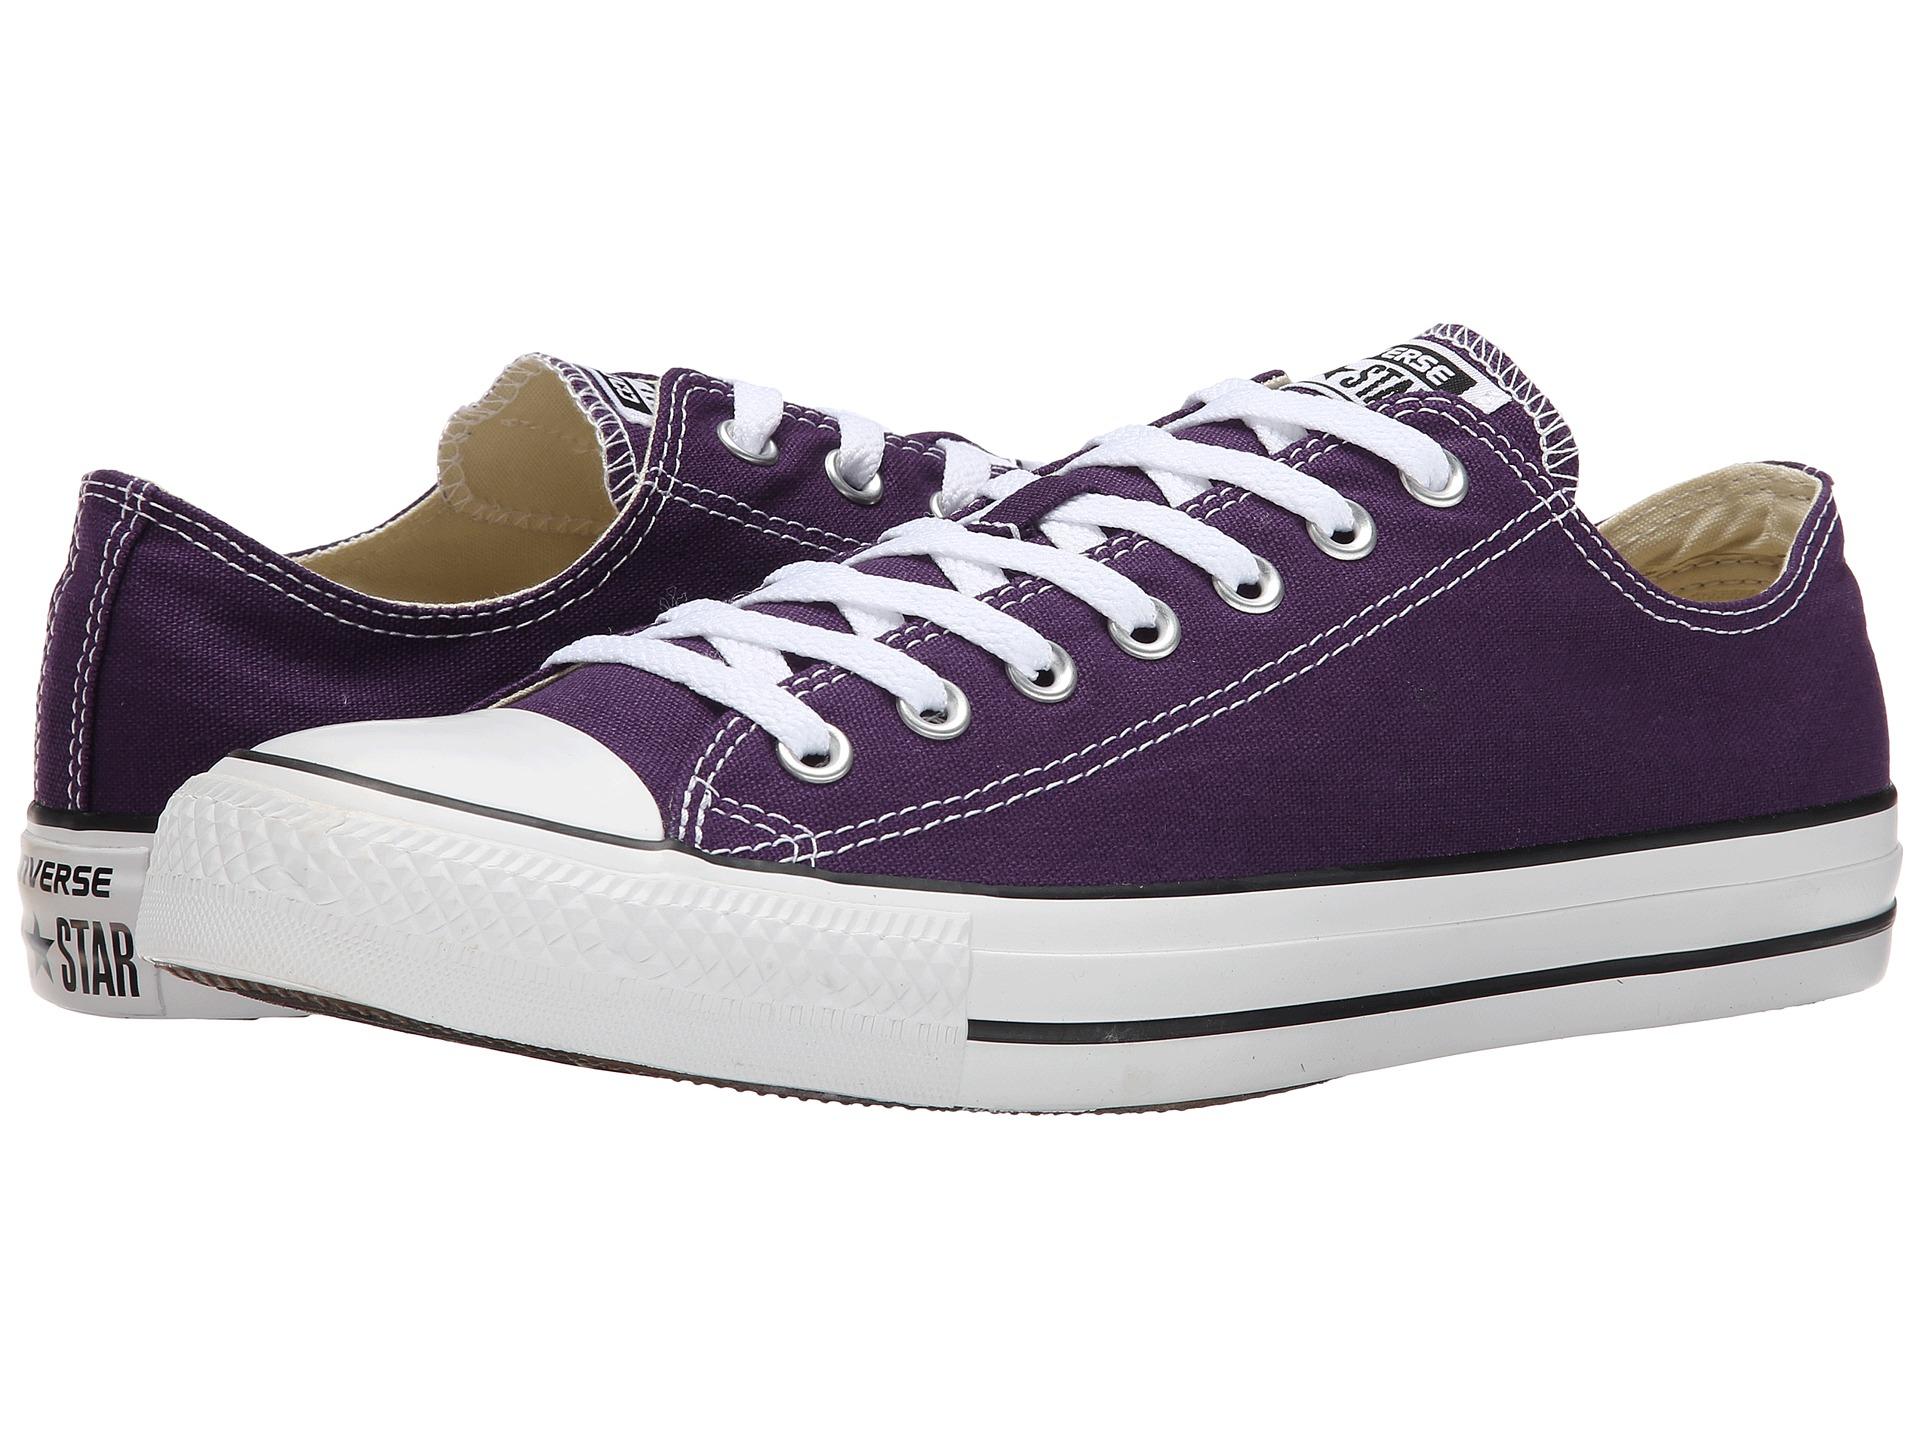 Eggplant Converse Shoes